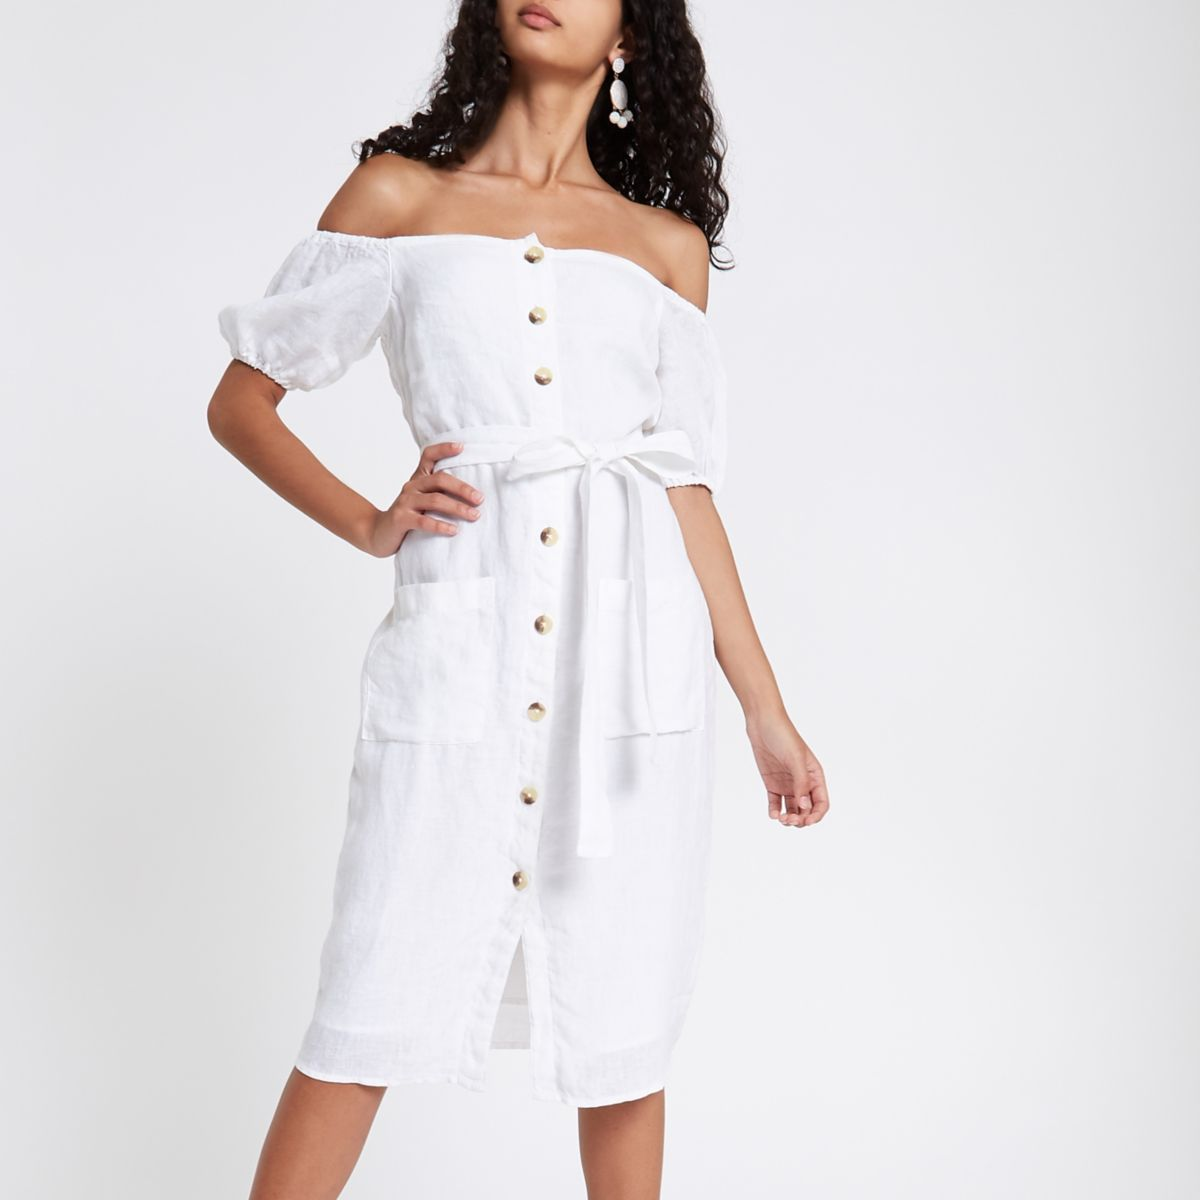 White button up bardot dress